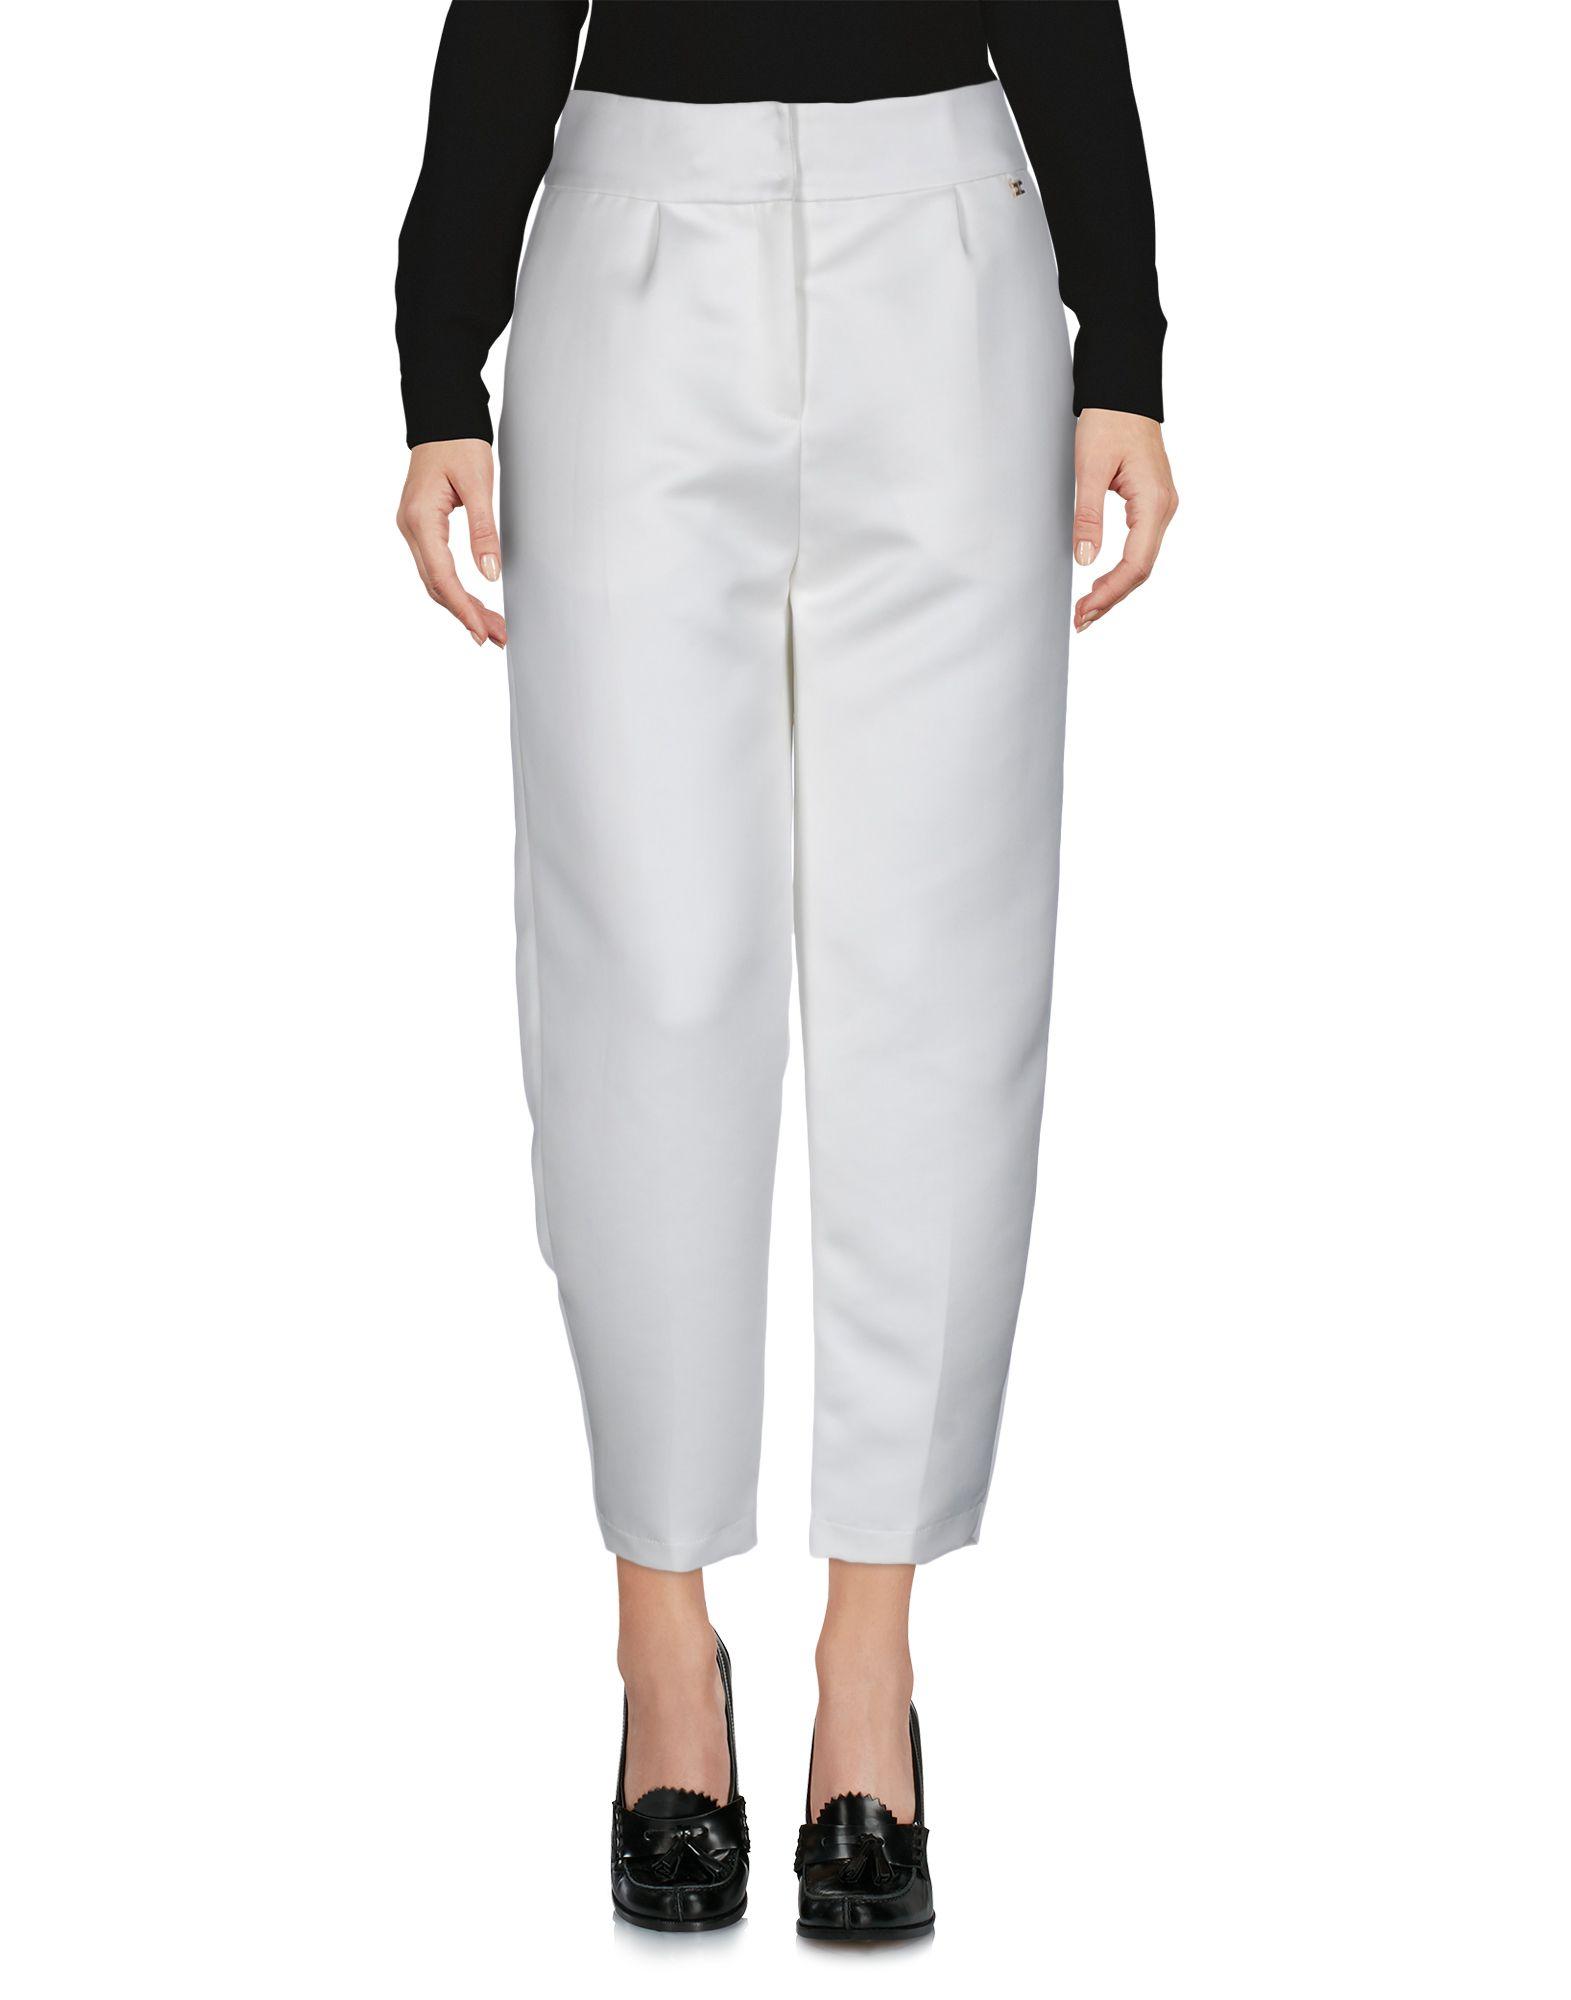 ELISABETTA FRANCHI GOLD Повседневные брюки elisabetta franchi брюки с вышивкой